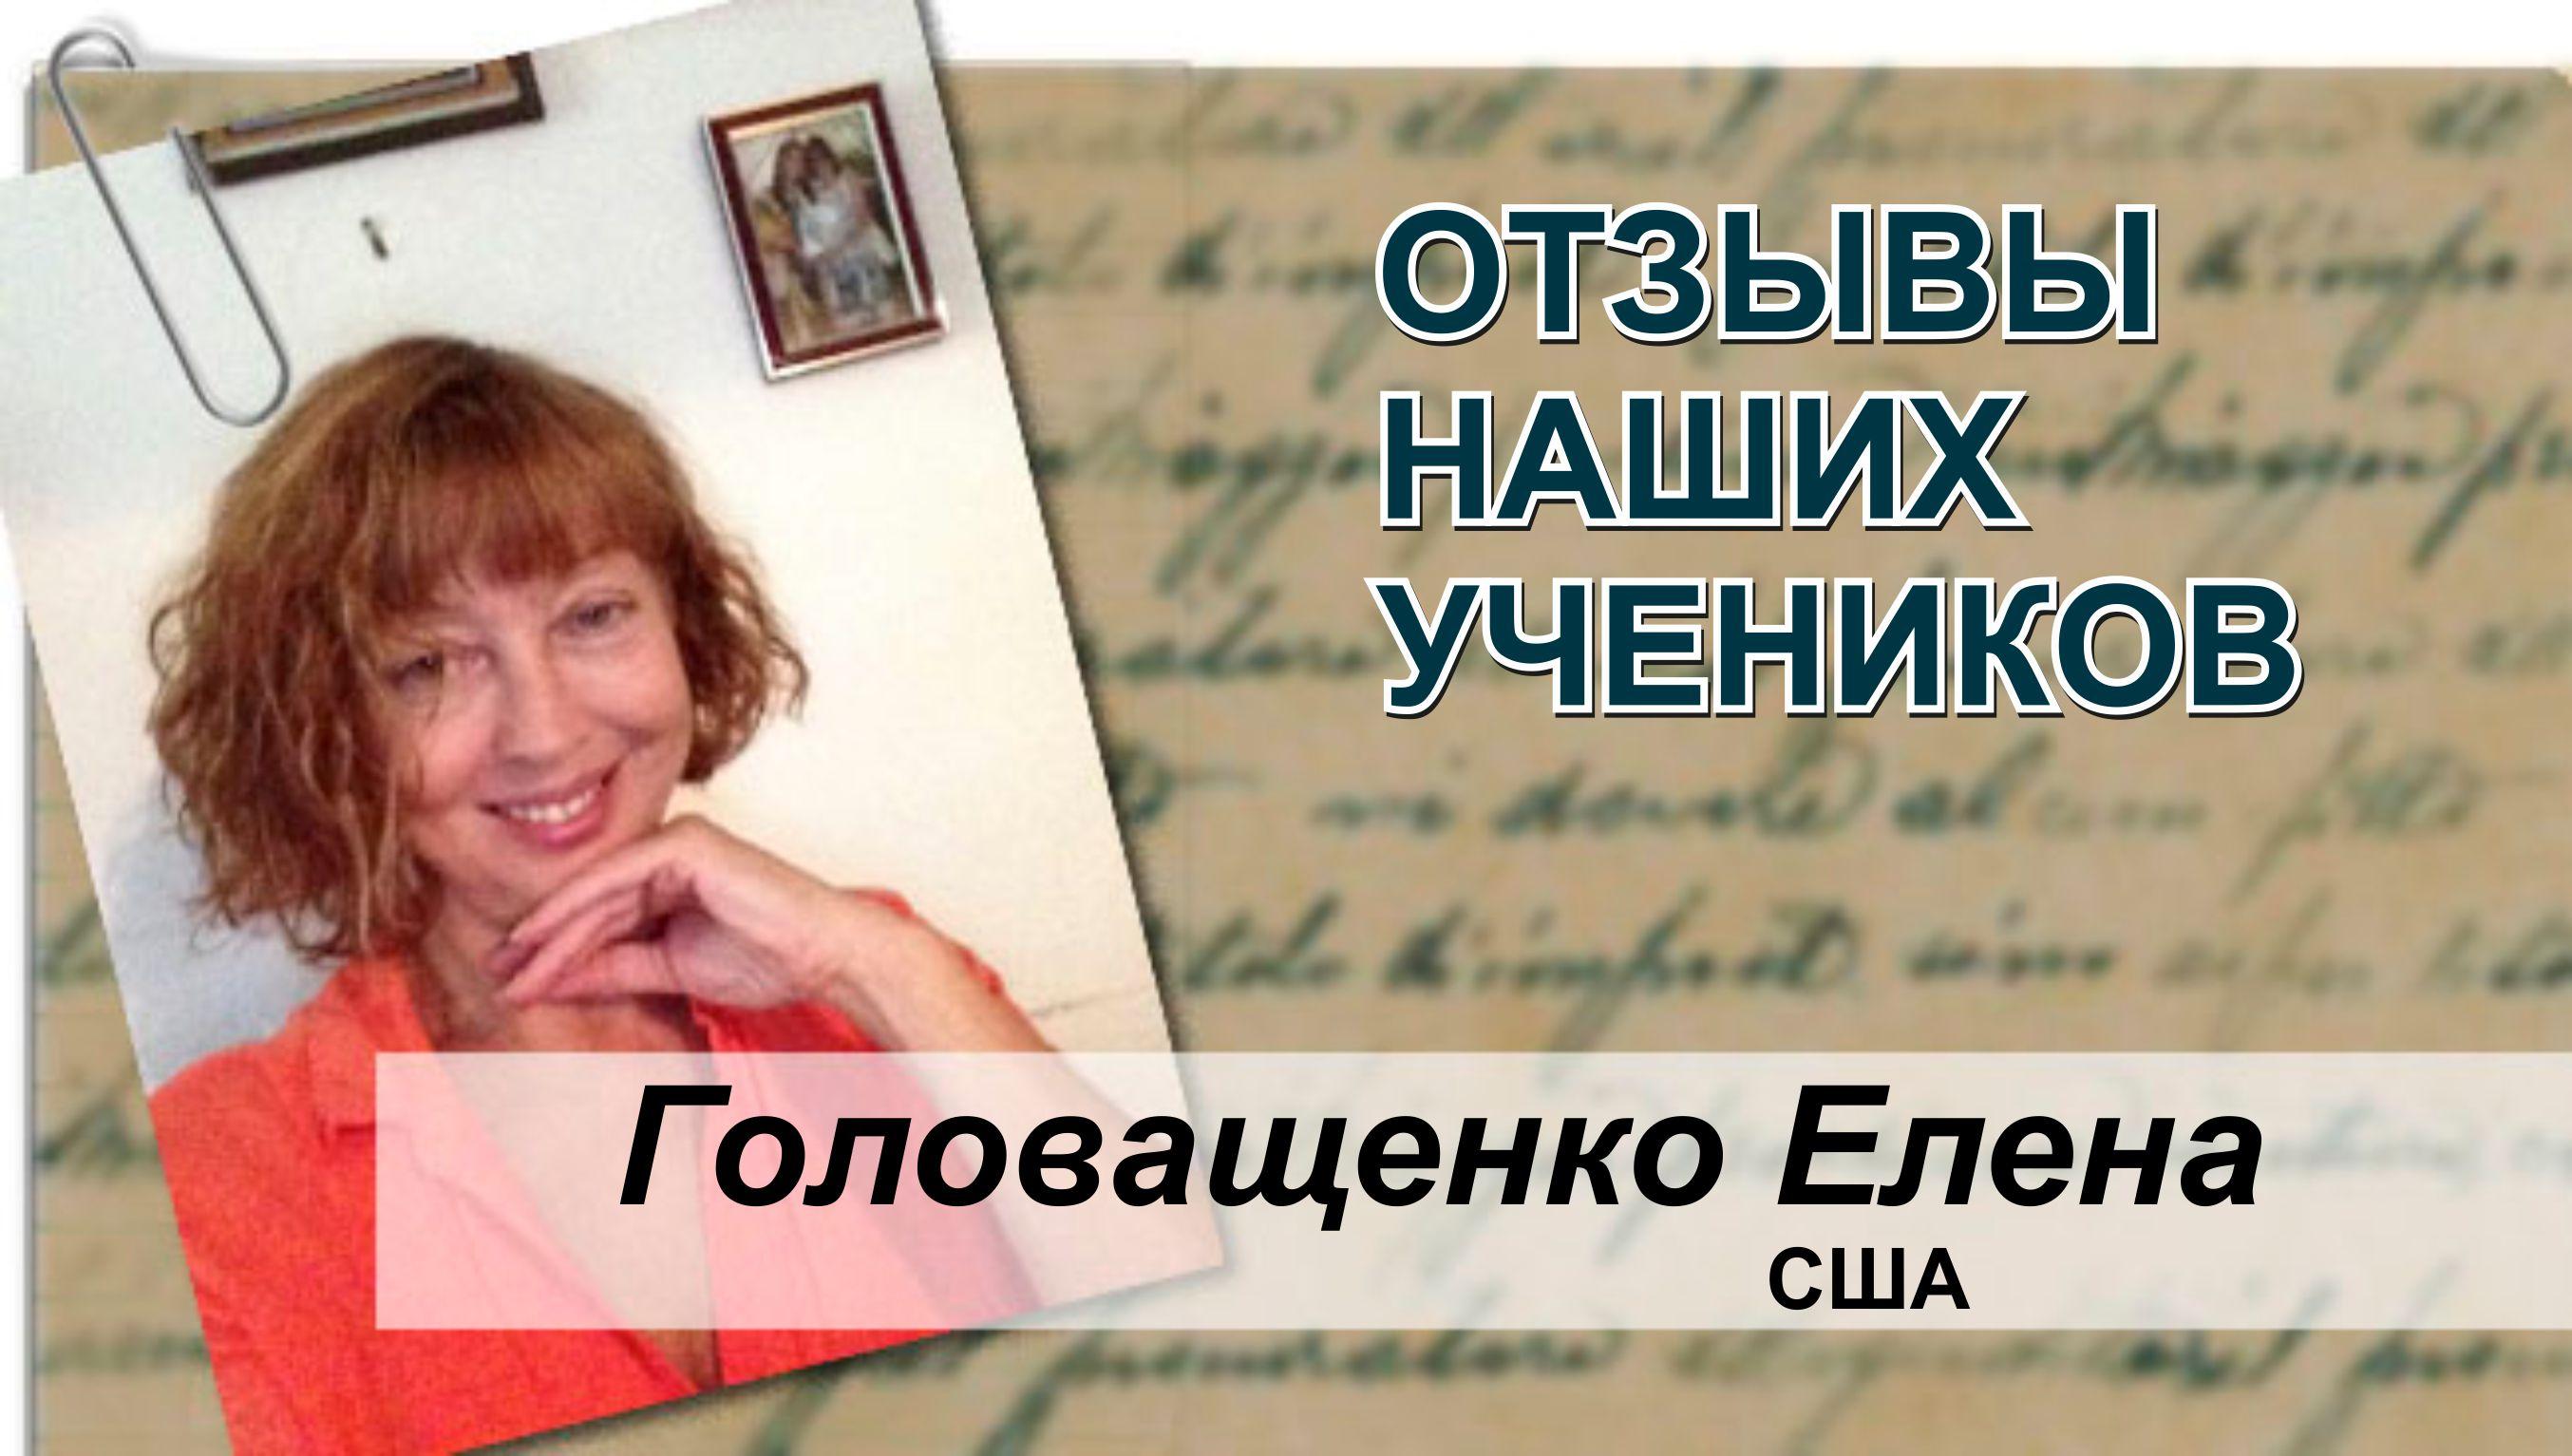 Головащенко Елена отзыв ЭМСА